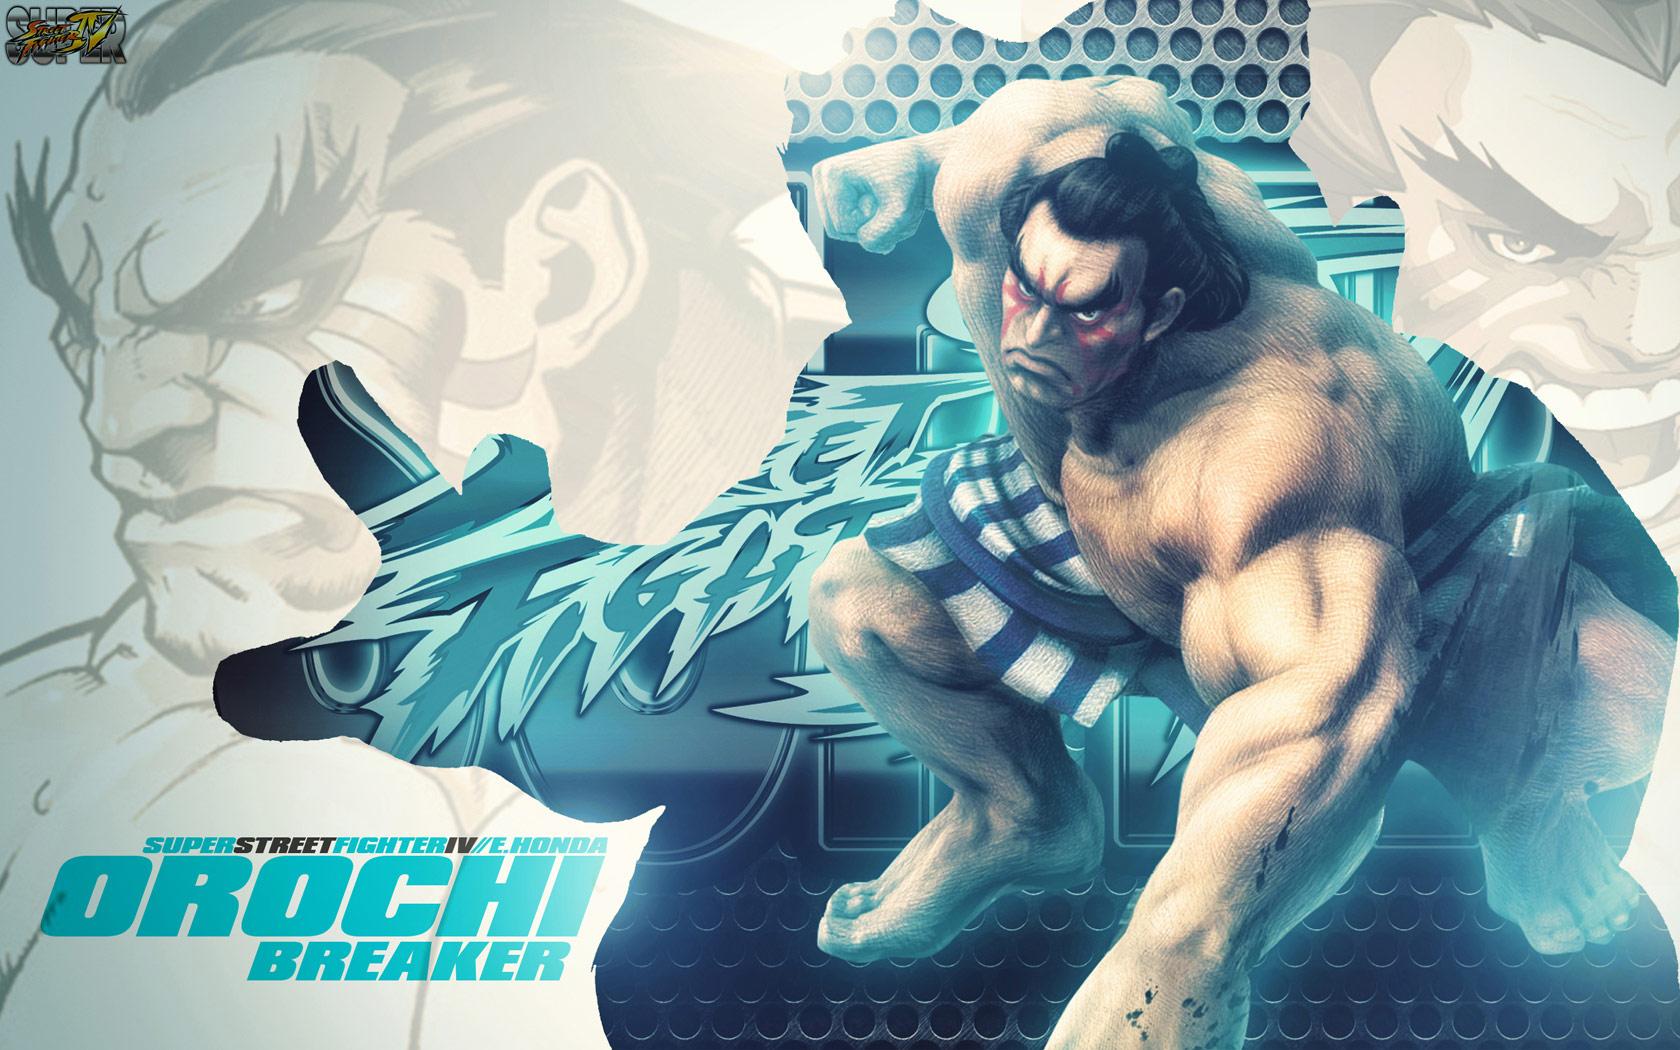 E. Honda Super Street Fighter 4 wallpaper by BossLogic